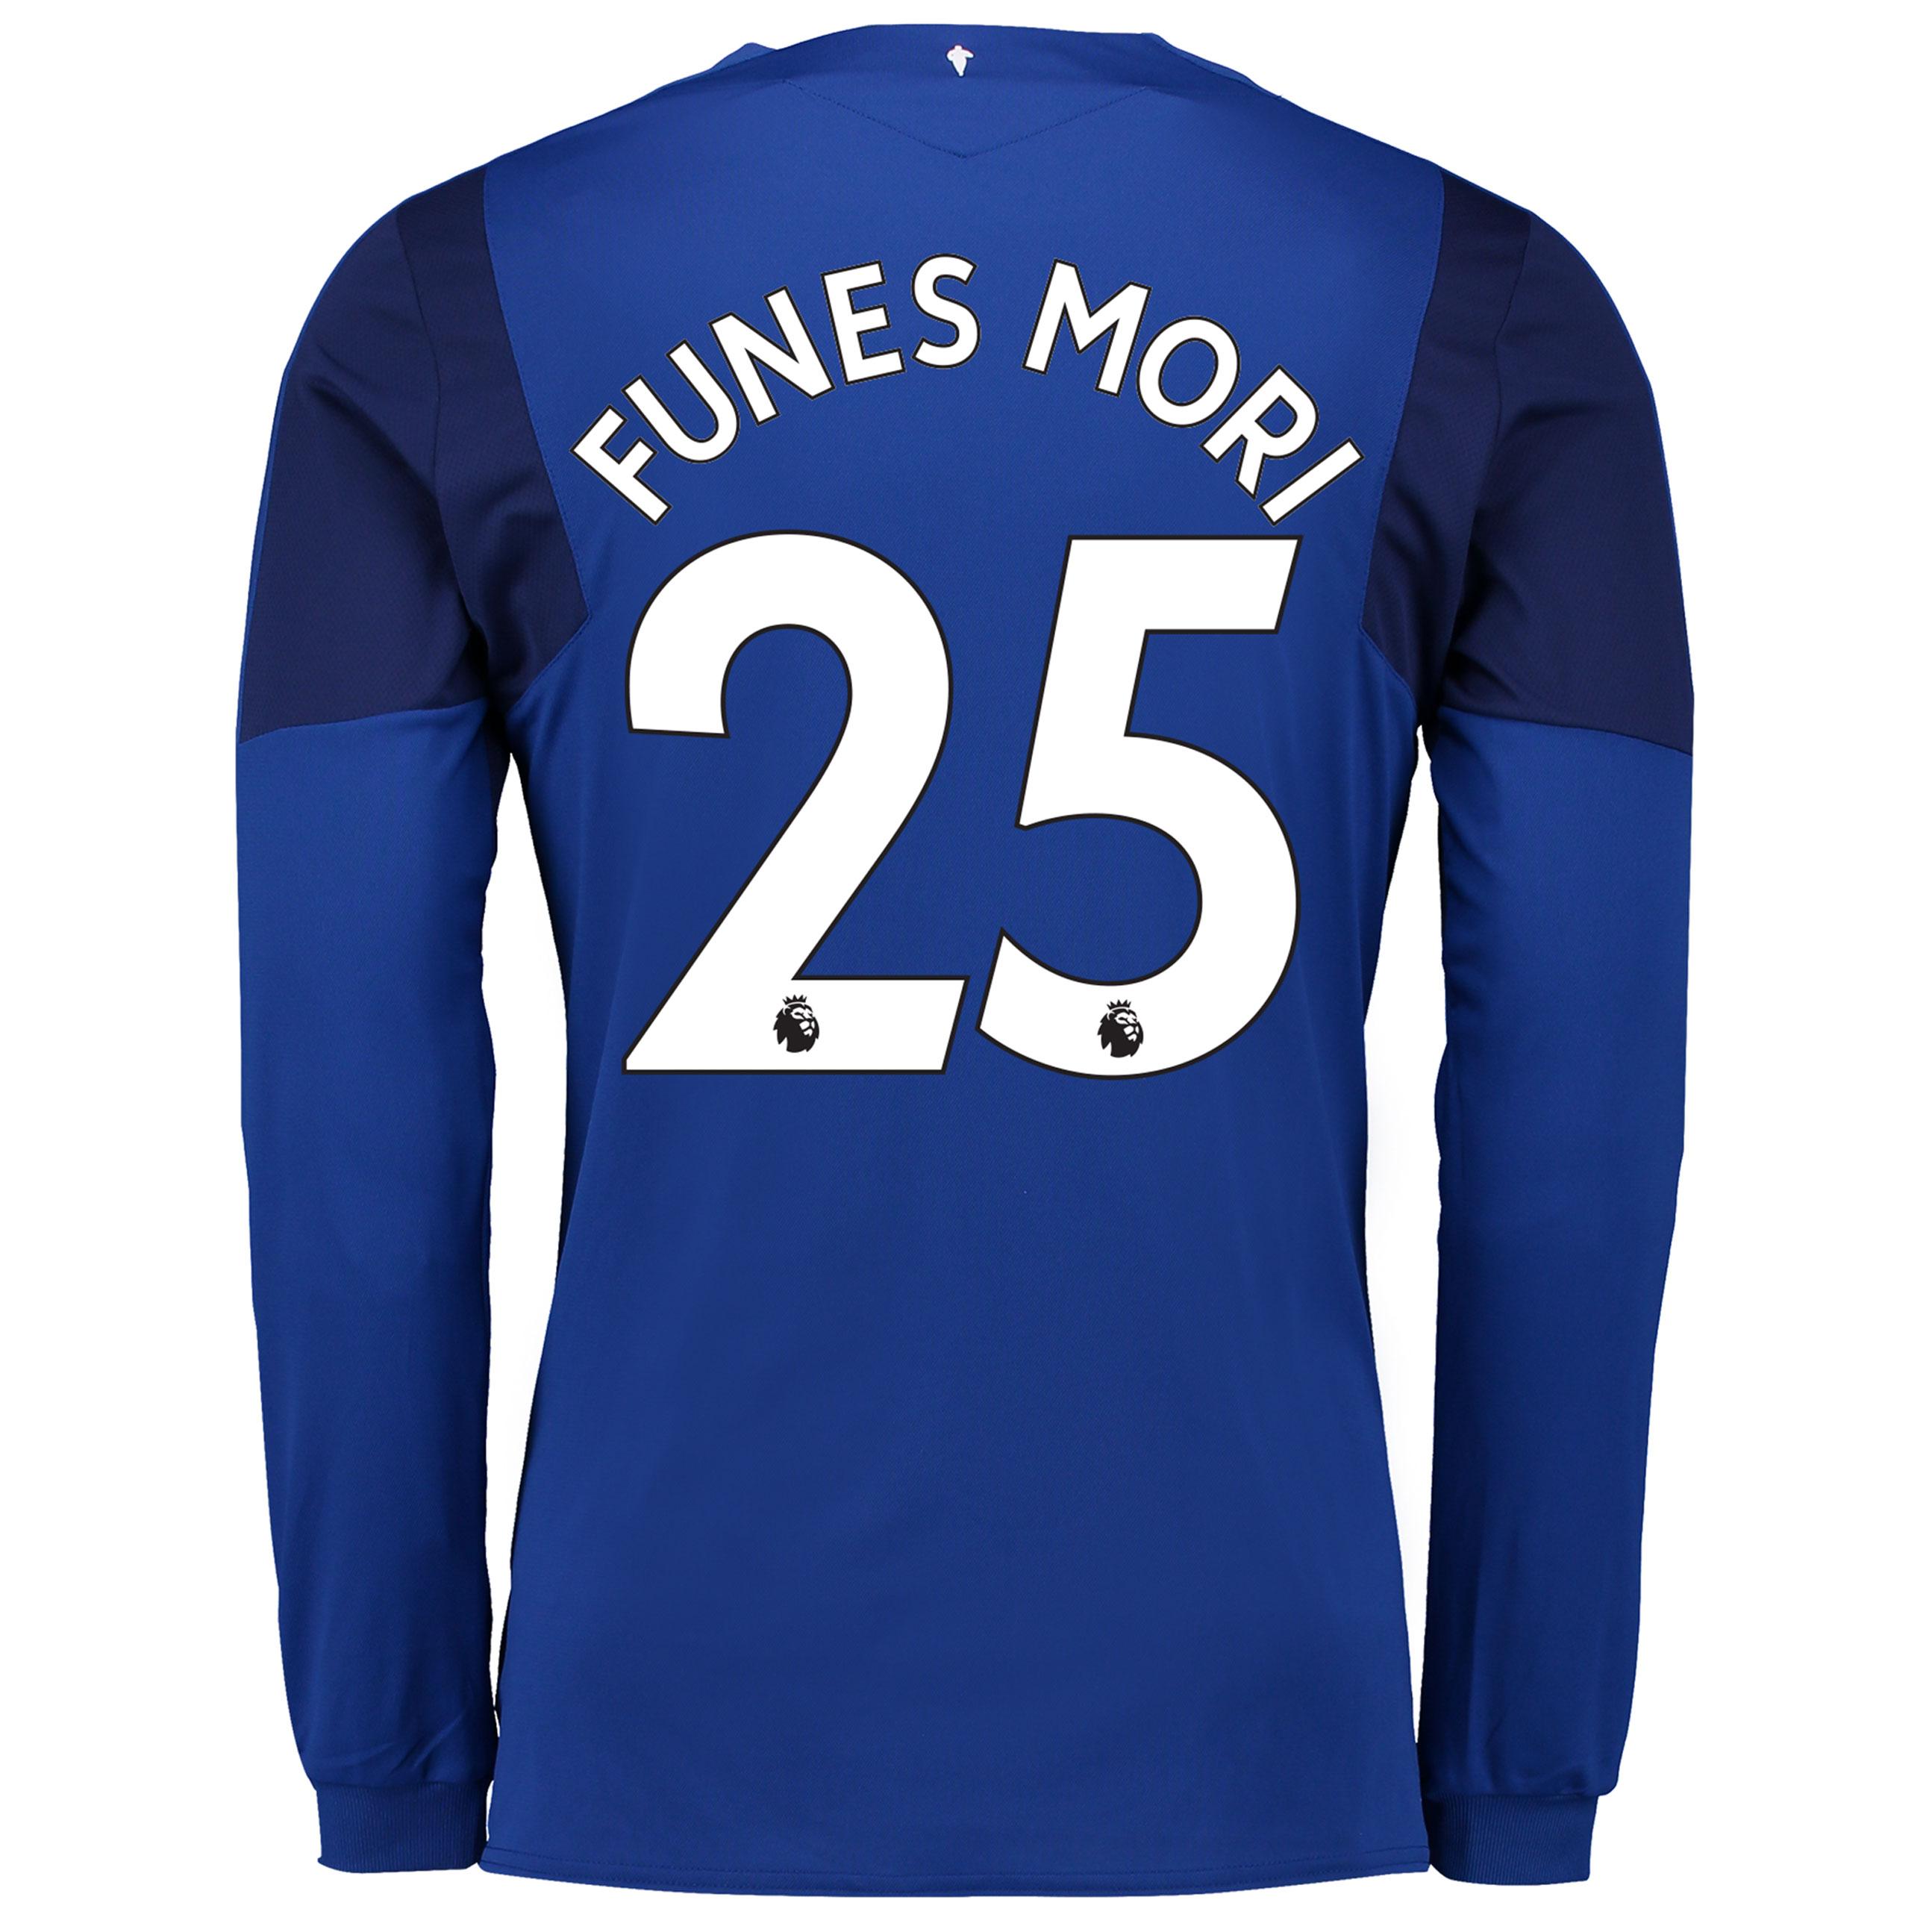 Everton Home Shirt 2017/18 - Long Sleeved with Funes Mori 25 printing